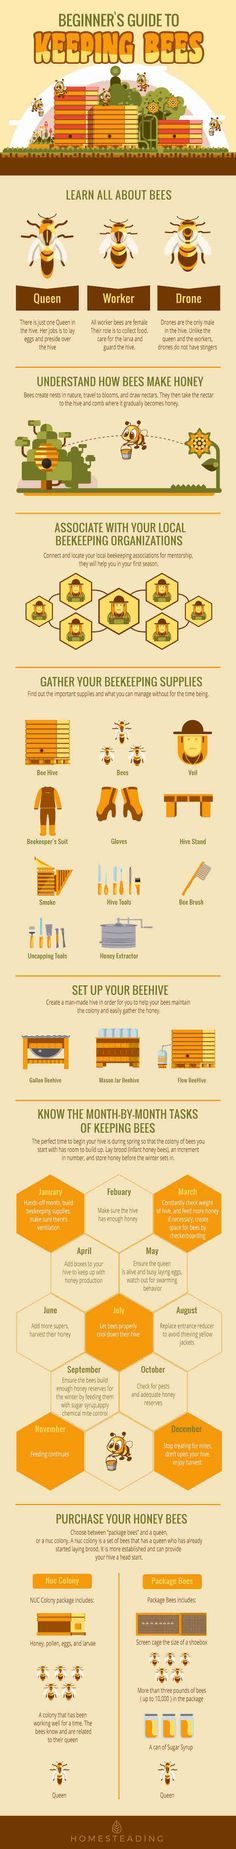 Beginners Guide To Keeping Bees : Homesteading Tips Beekeeping For Beginners, Raising Bees, Raising Chickens, Bee House, Backyard Beekeeping, Backyard Chickens, Bee Farm, Mini Farm, Farm Gardens